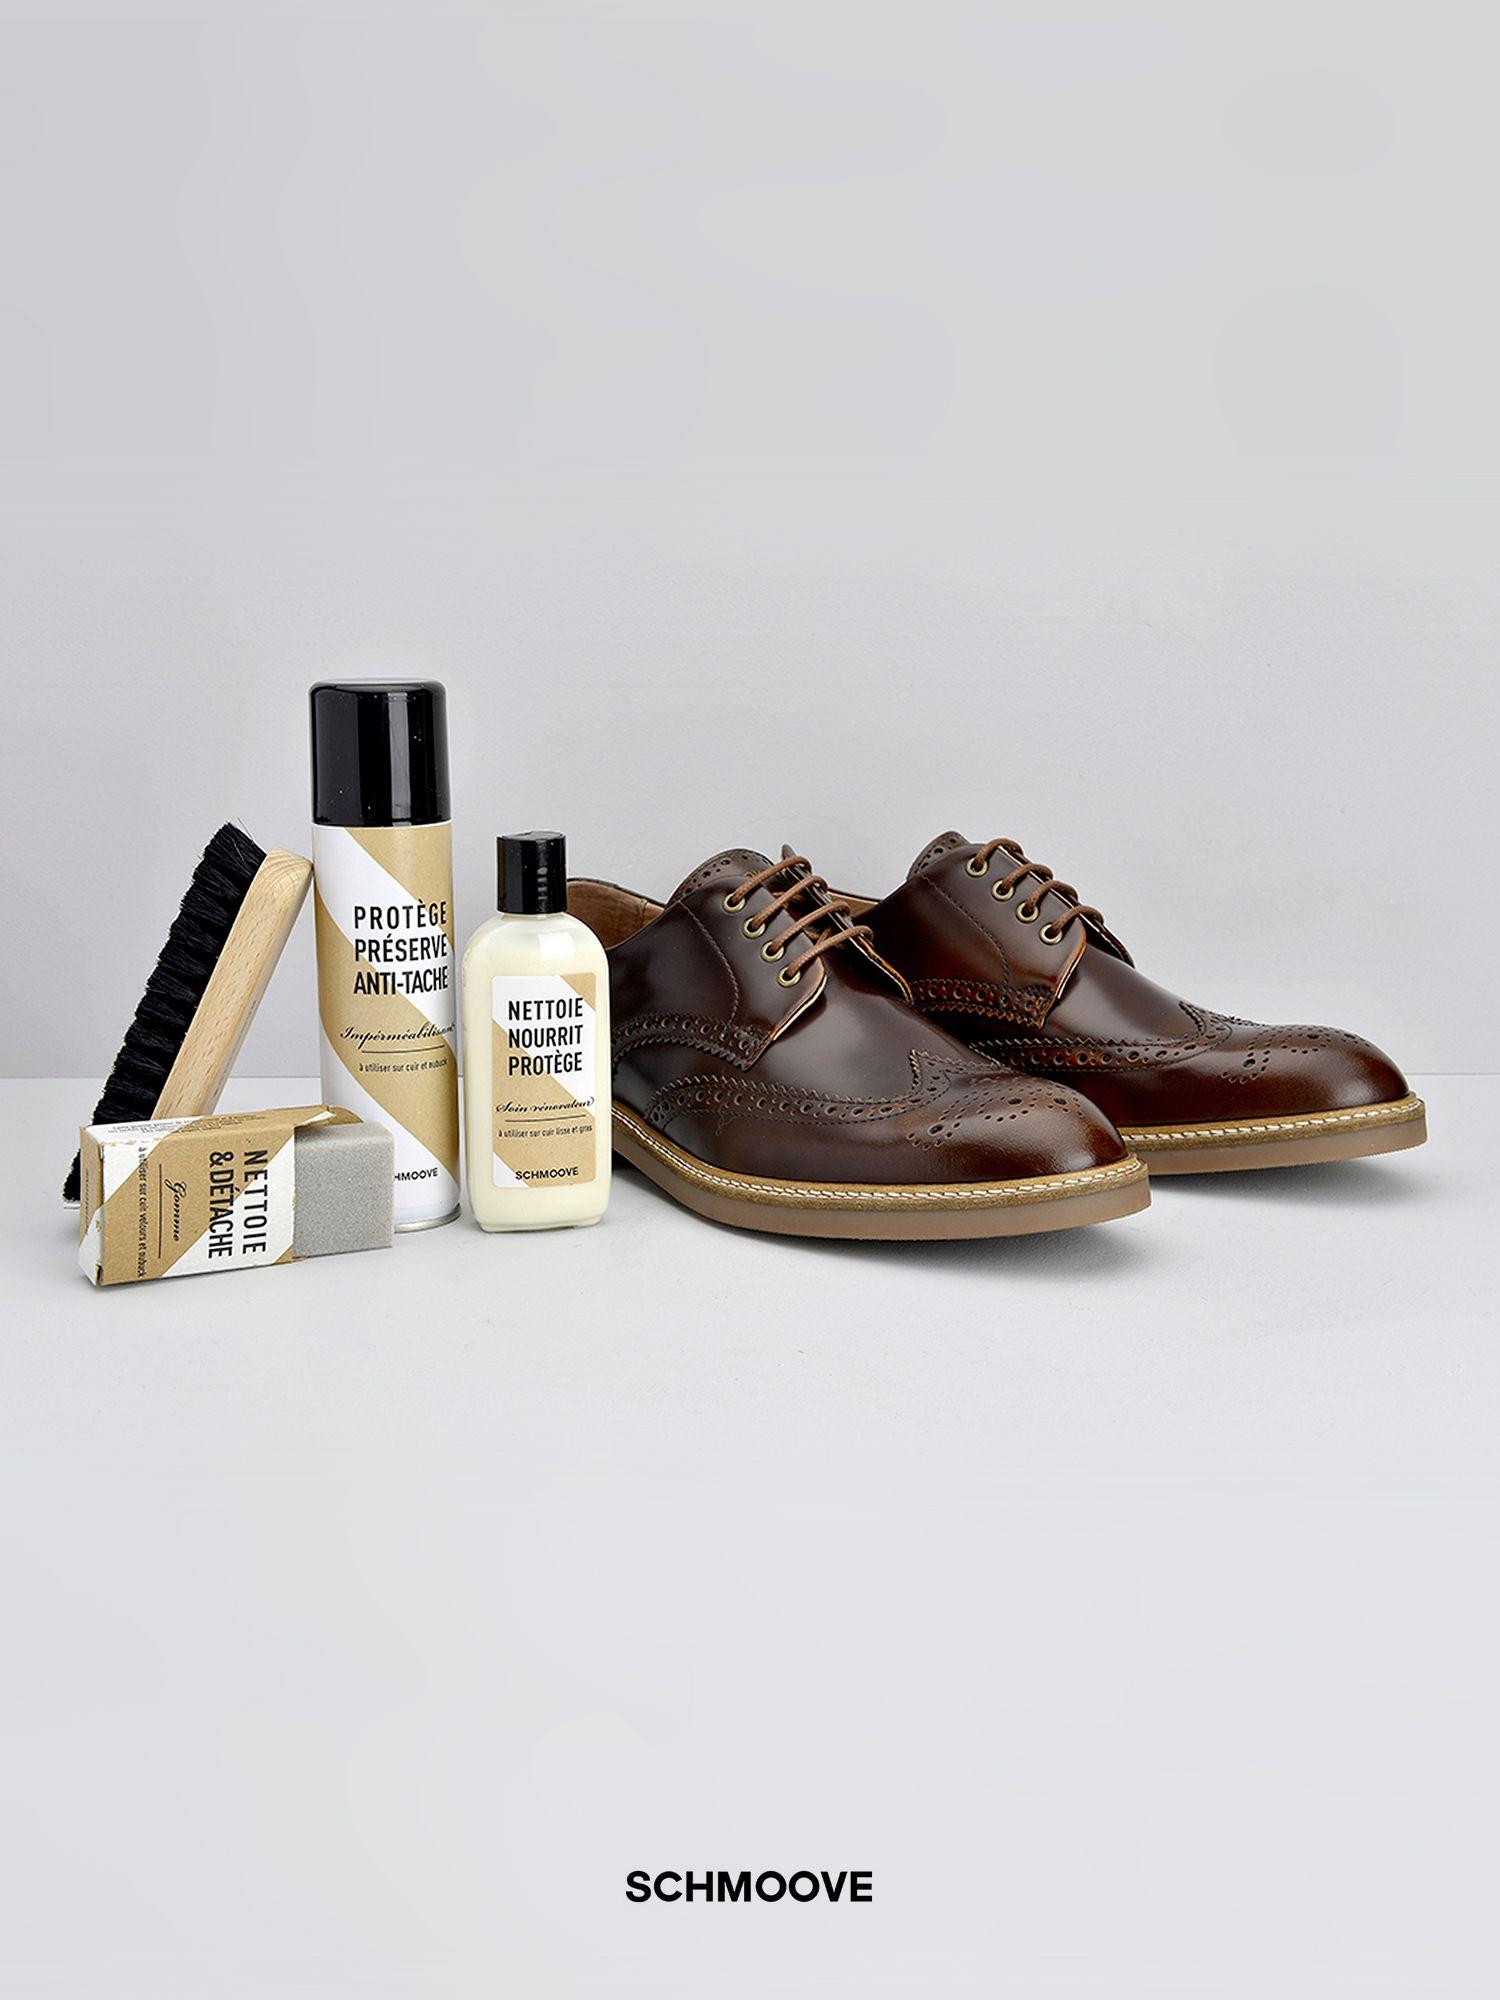 schmoove.fr Shoe care kit